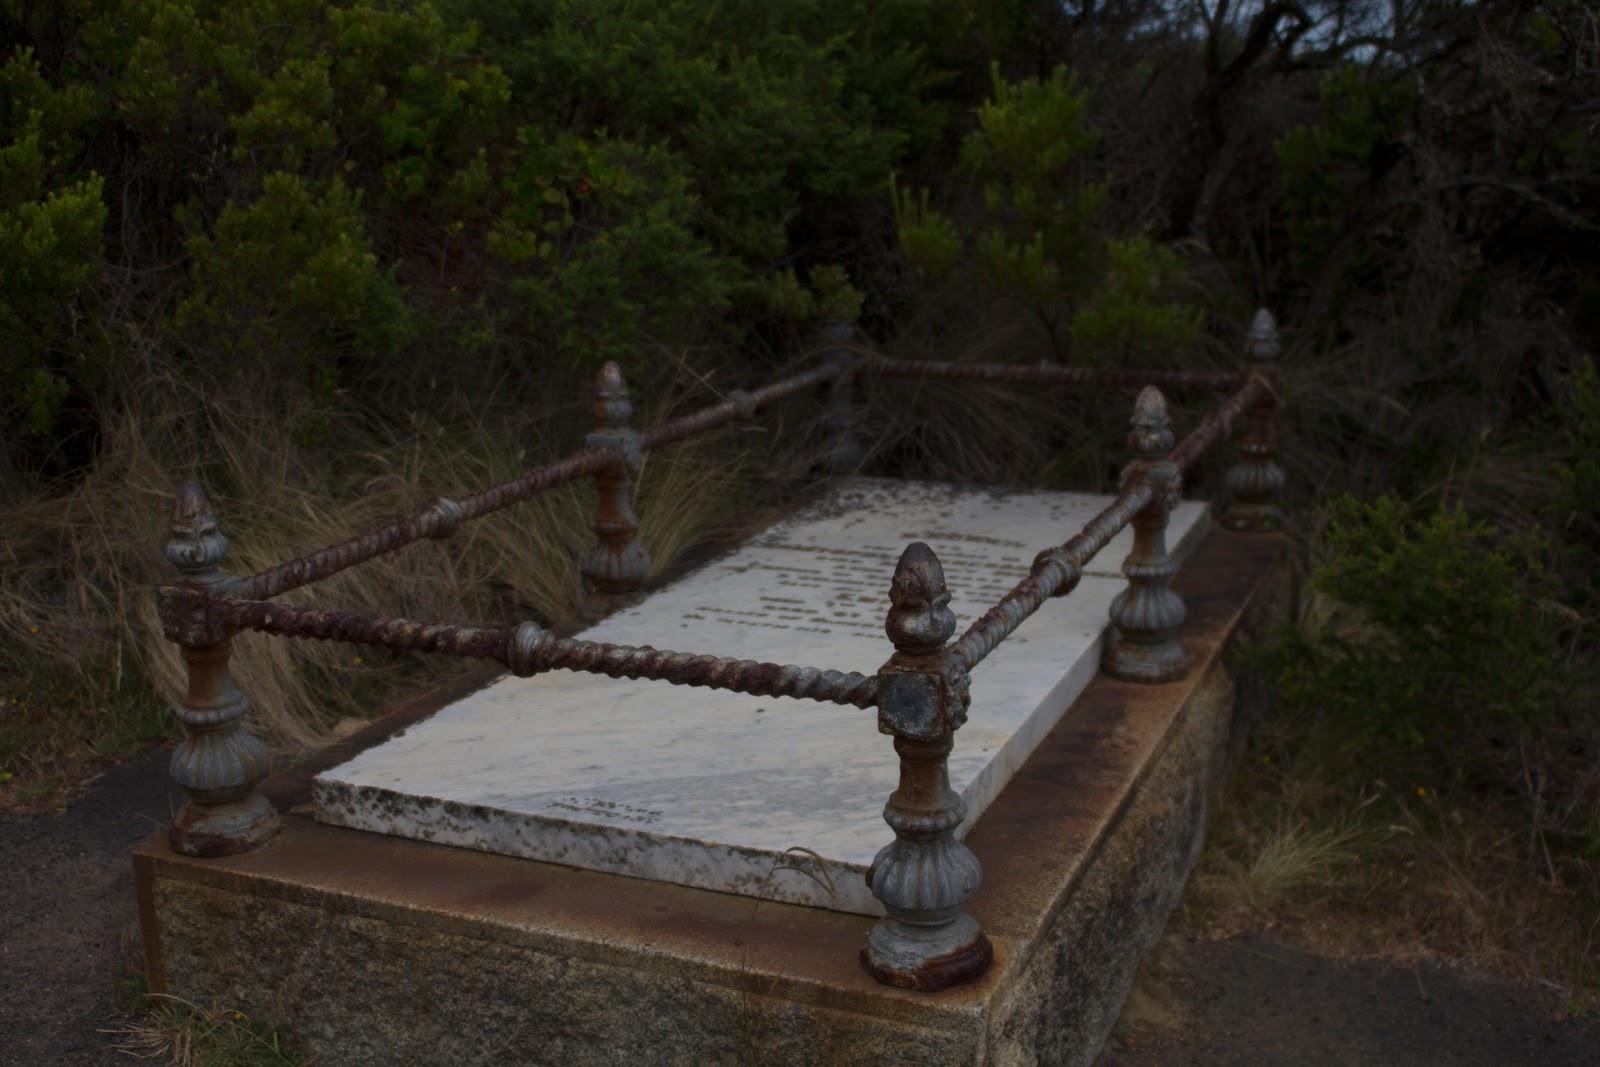 Cmentarz,Great Ocean Road,formacje sklane